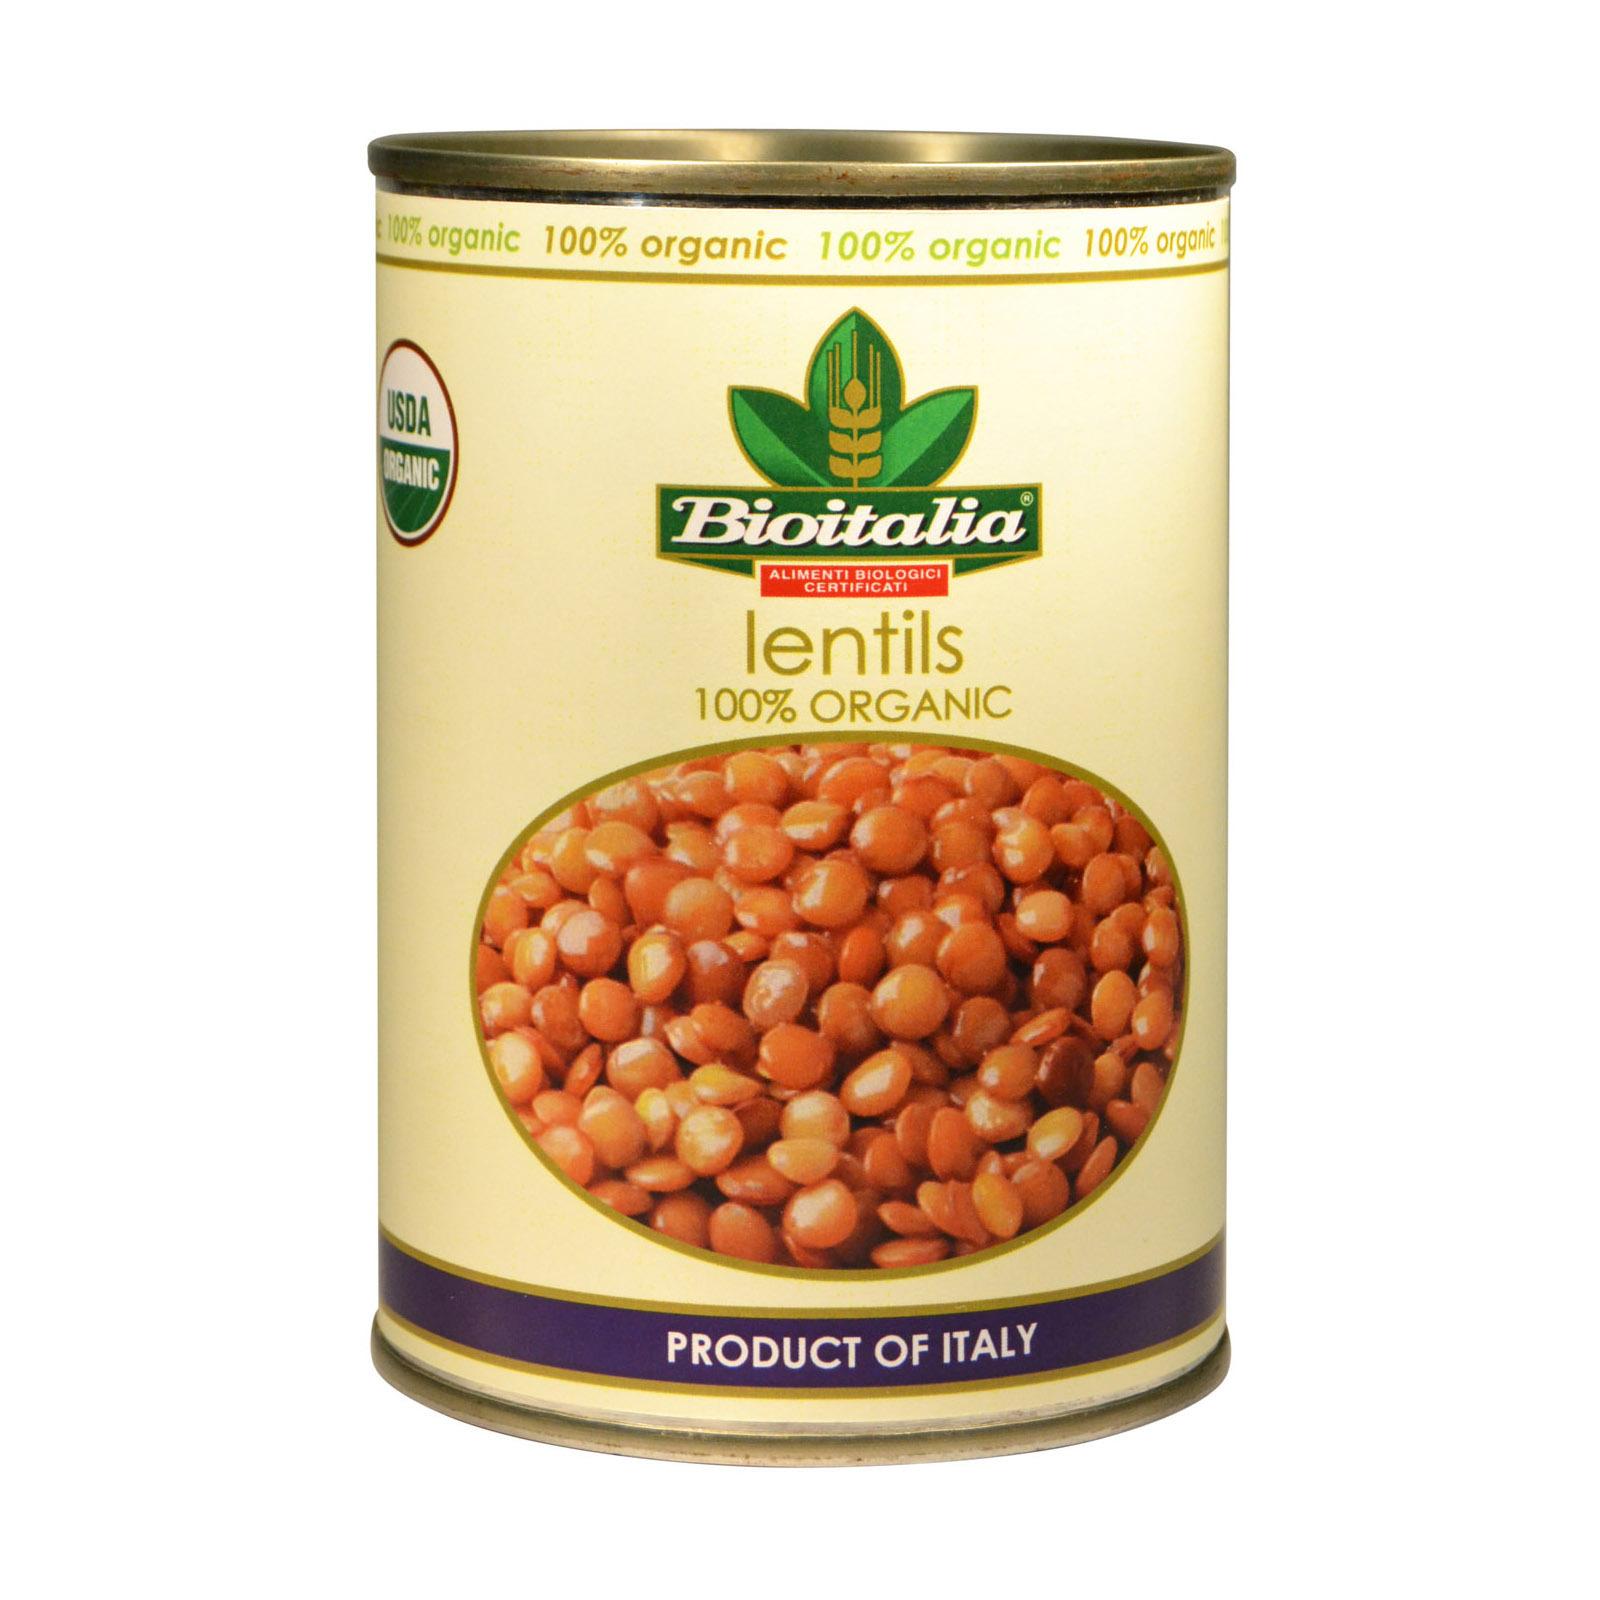 Bioitalia Organic Beans - Lentils - Case of 12 - 14 oz.